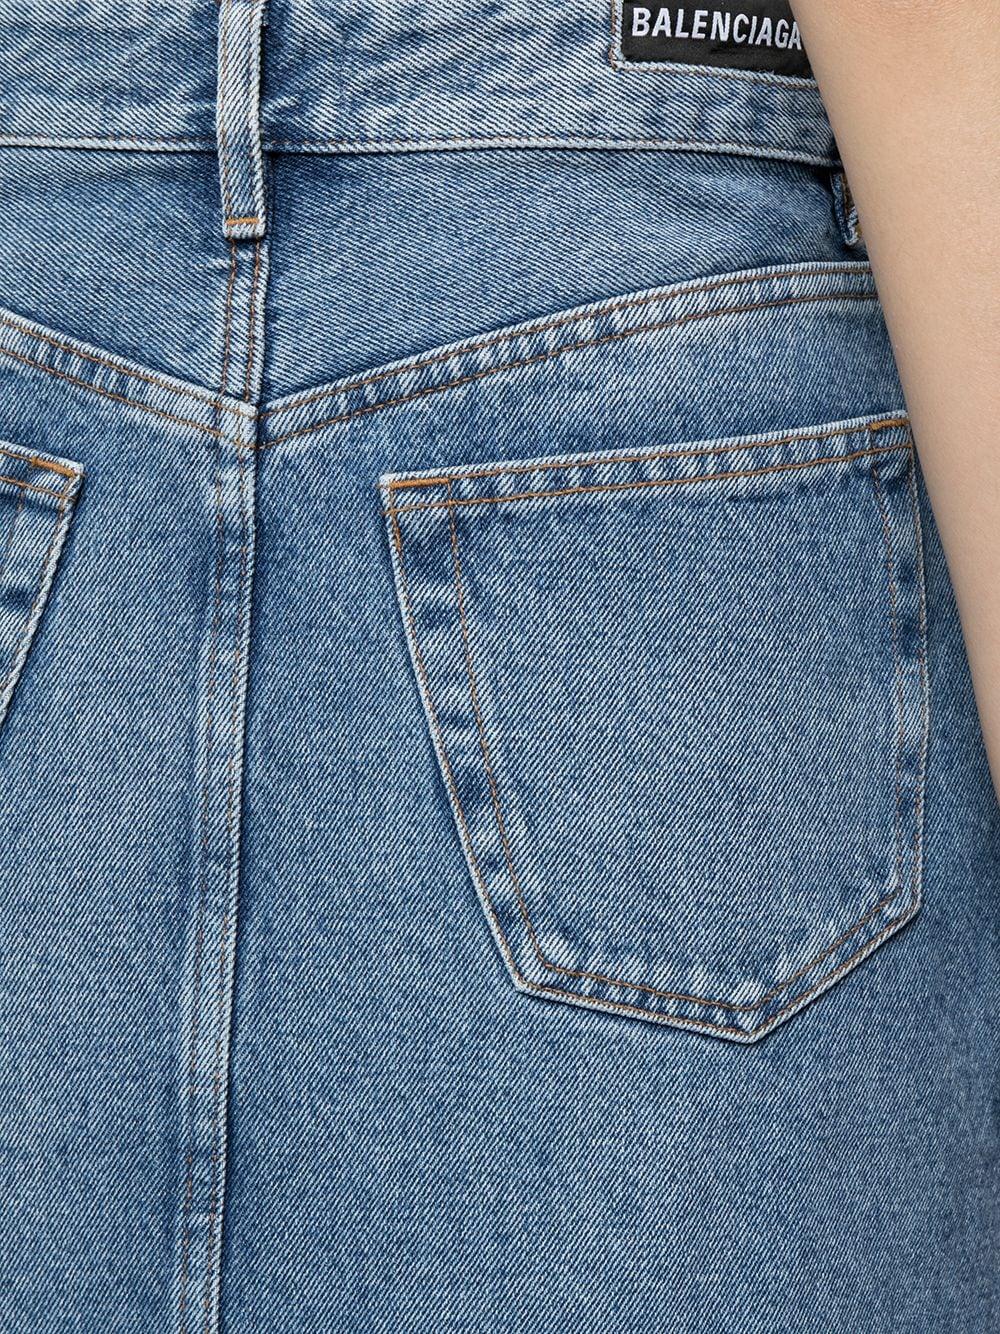 Blue cotton A-line denim skirt featuring high waist and distressed effect BALENCIAGA      646913-TDW154762